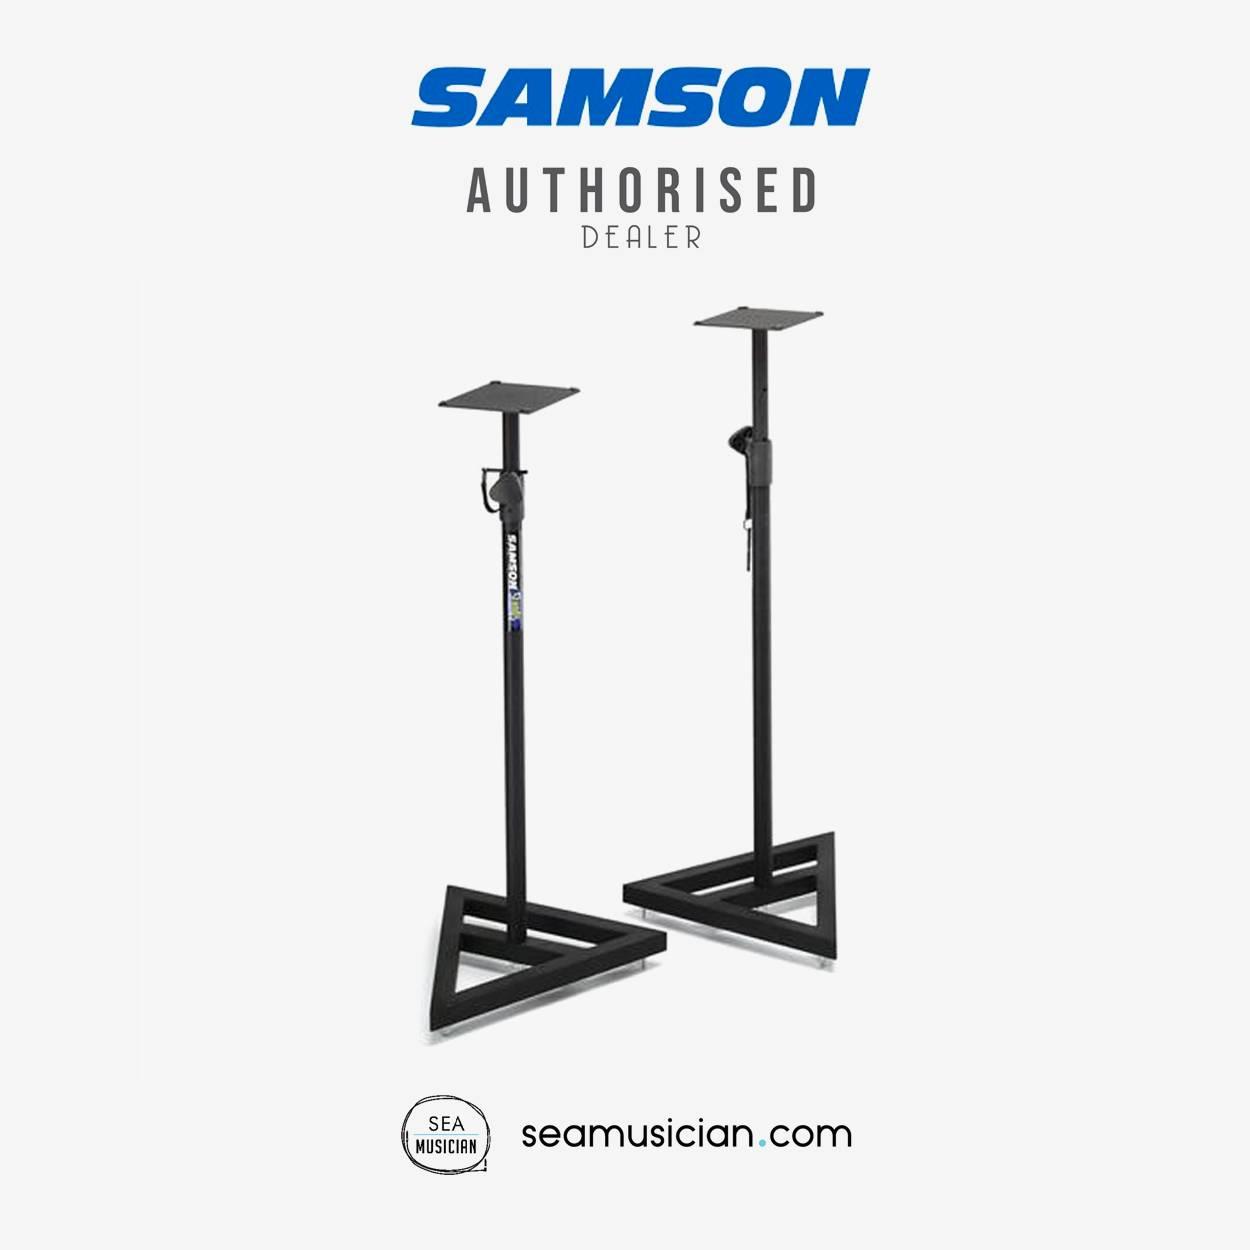 Samson MS200 Studio Monitor Stands pair